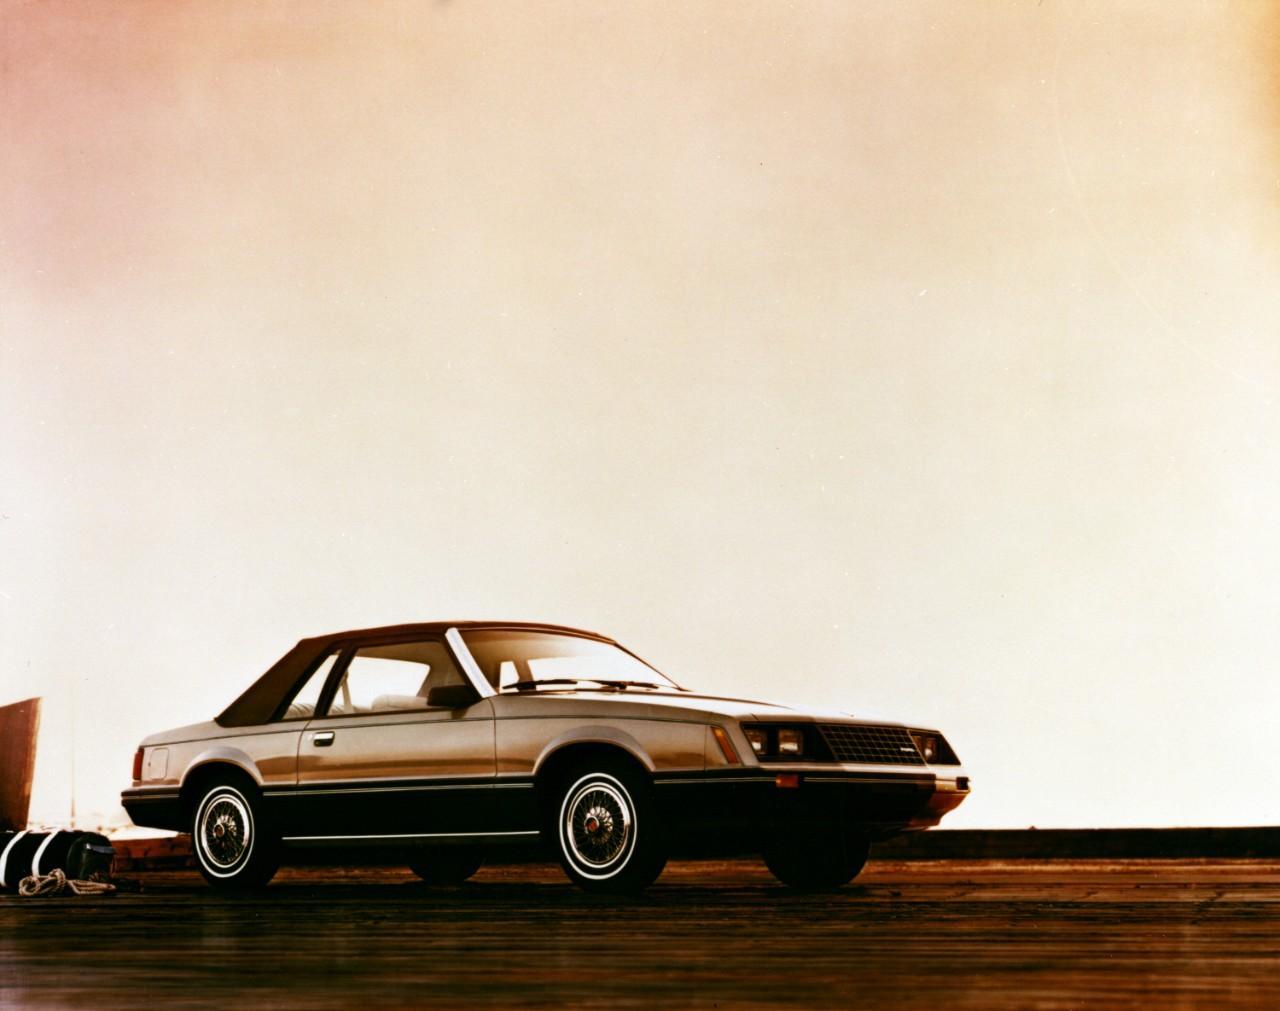 Ford Mustang Ghia